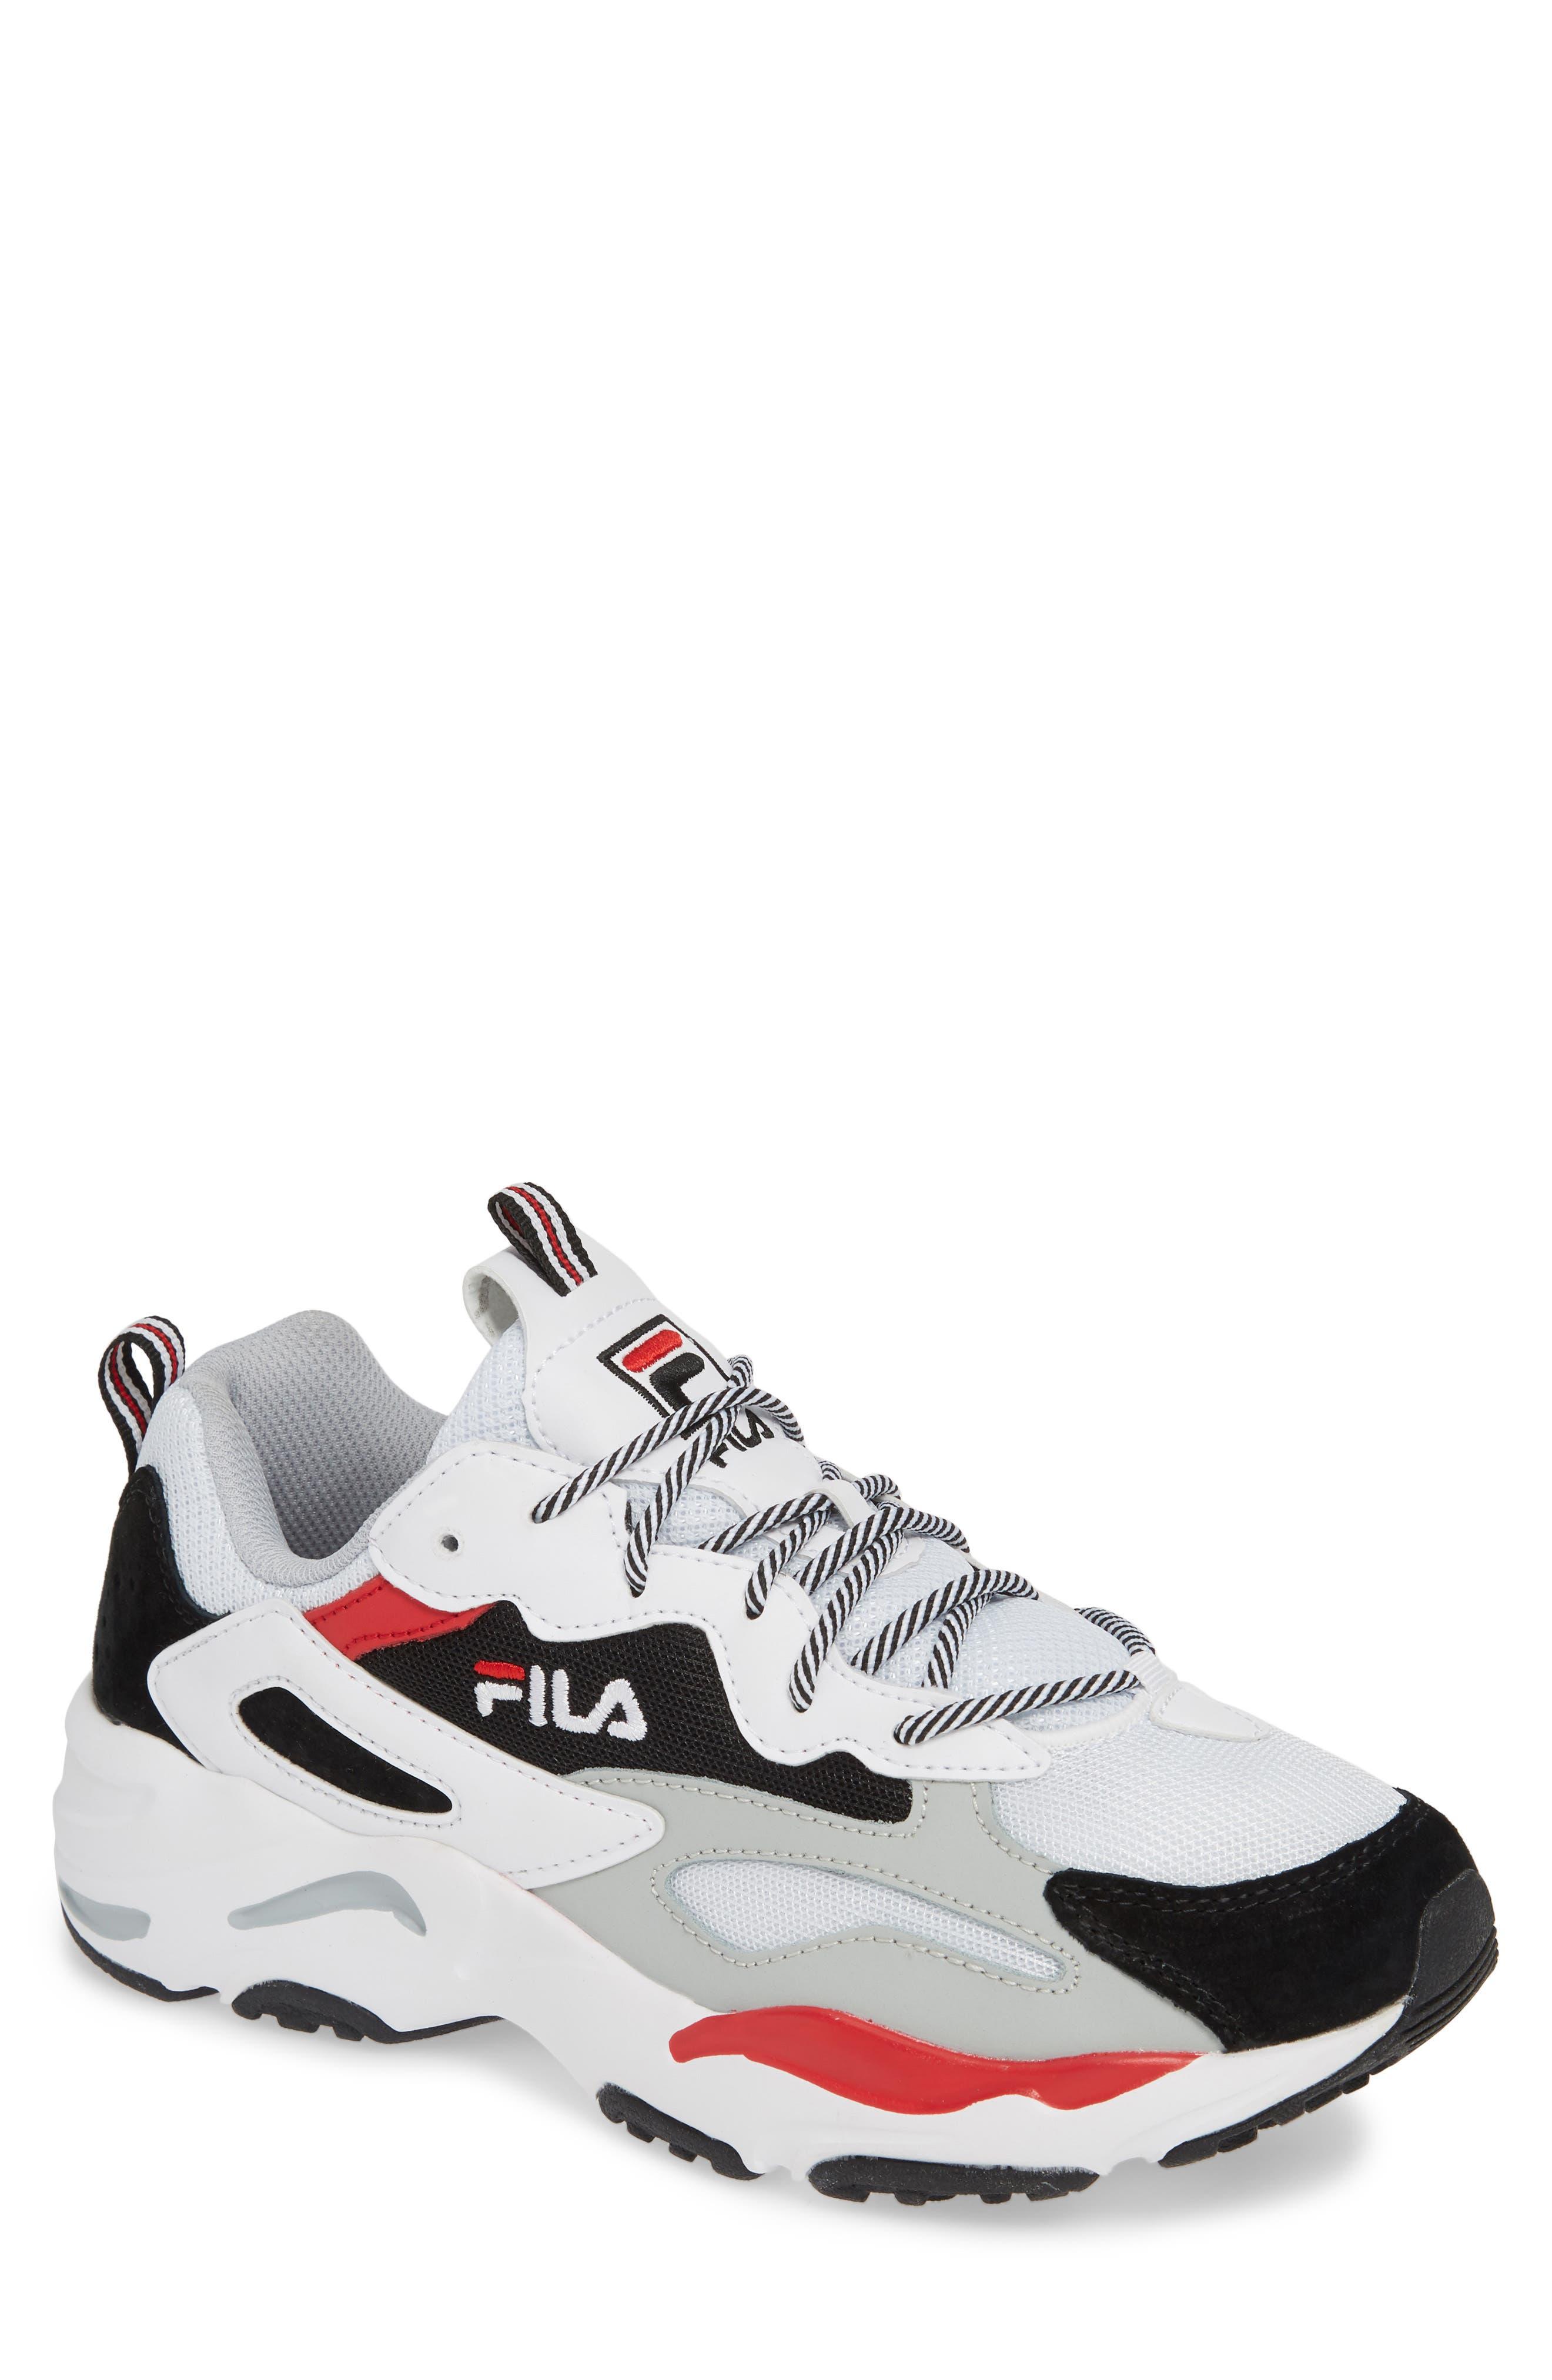 FILA Ray Tracer Sneaker, Main, color, WHITE/ BLACK